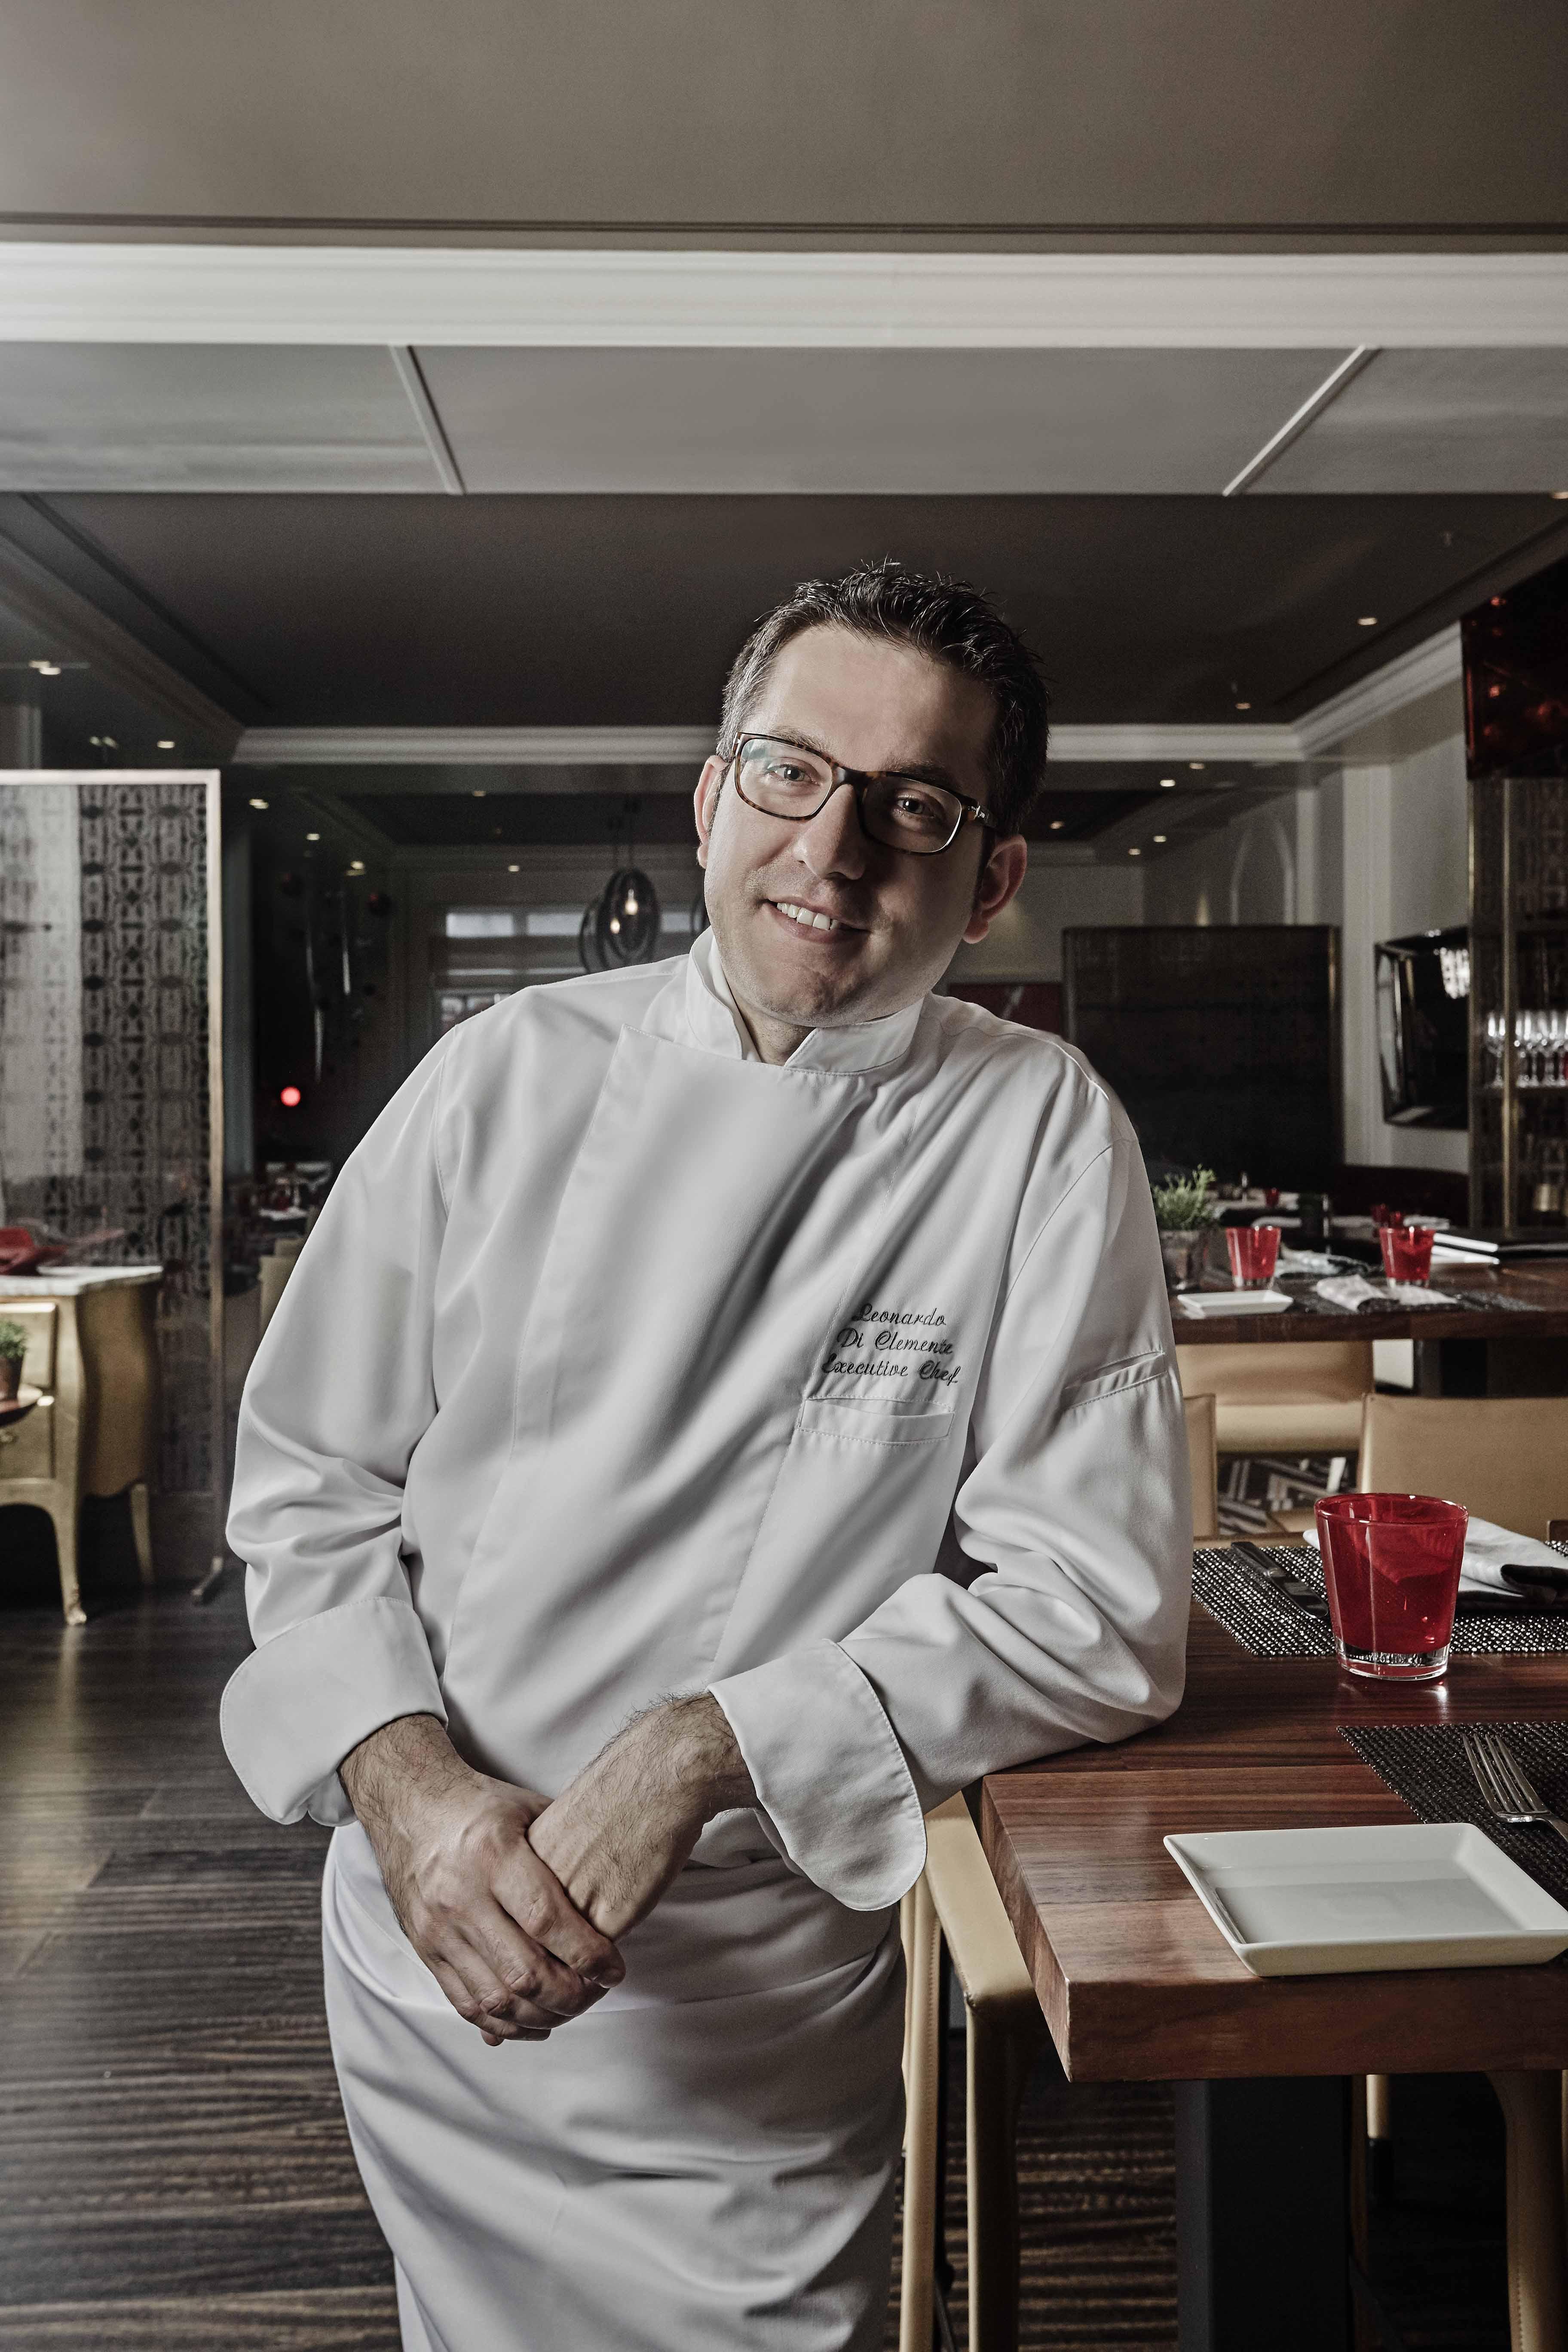 Šéfkuchař Leonardo Di Clemente představuje nové menu v CottoCrudo